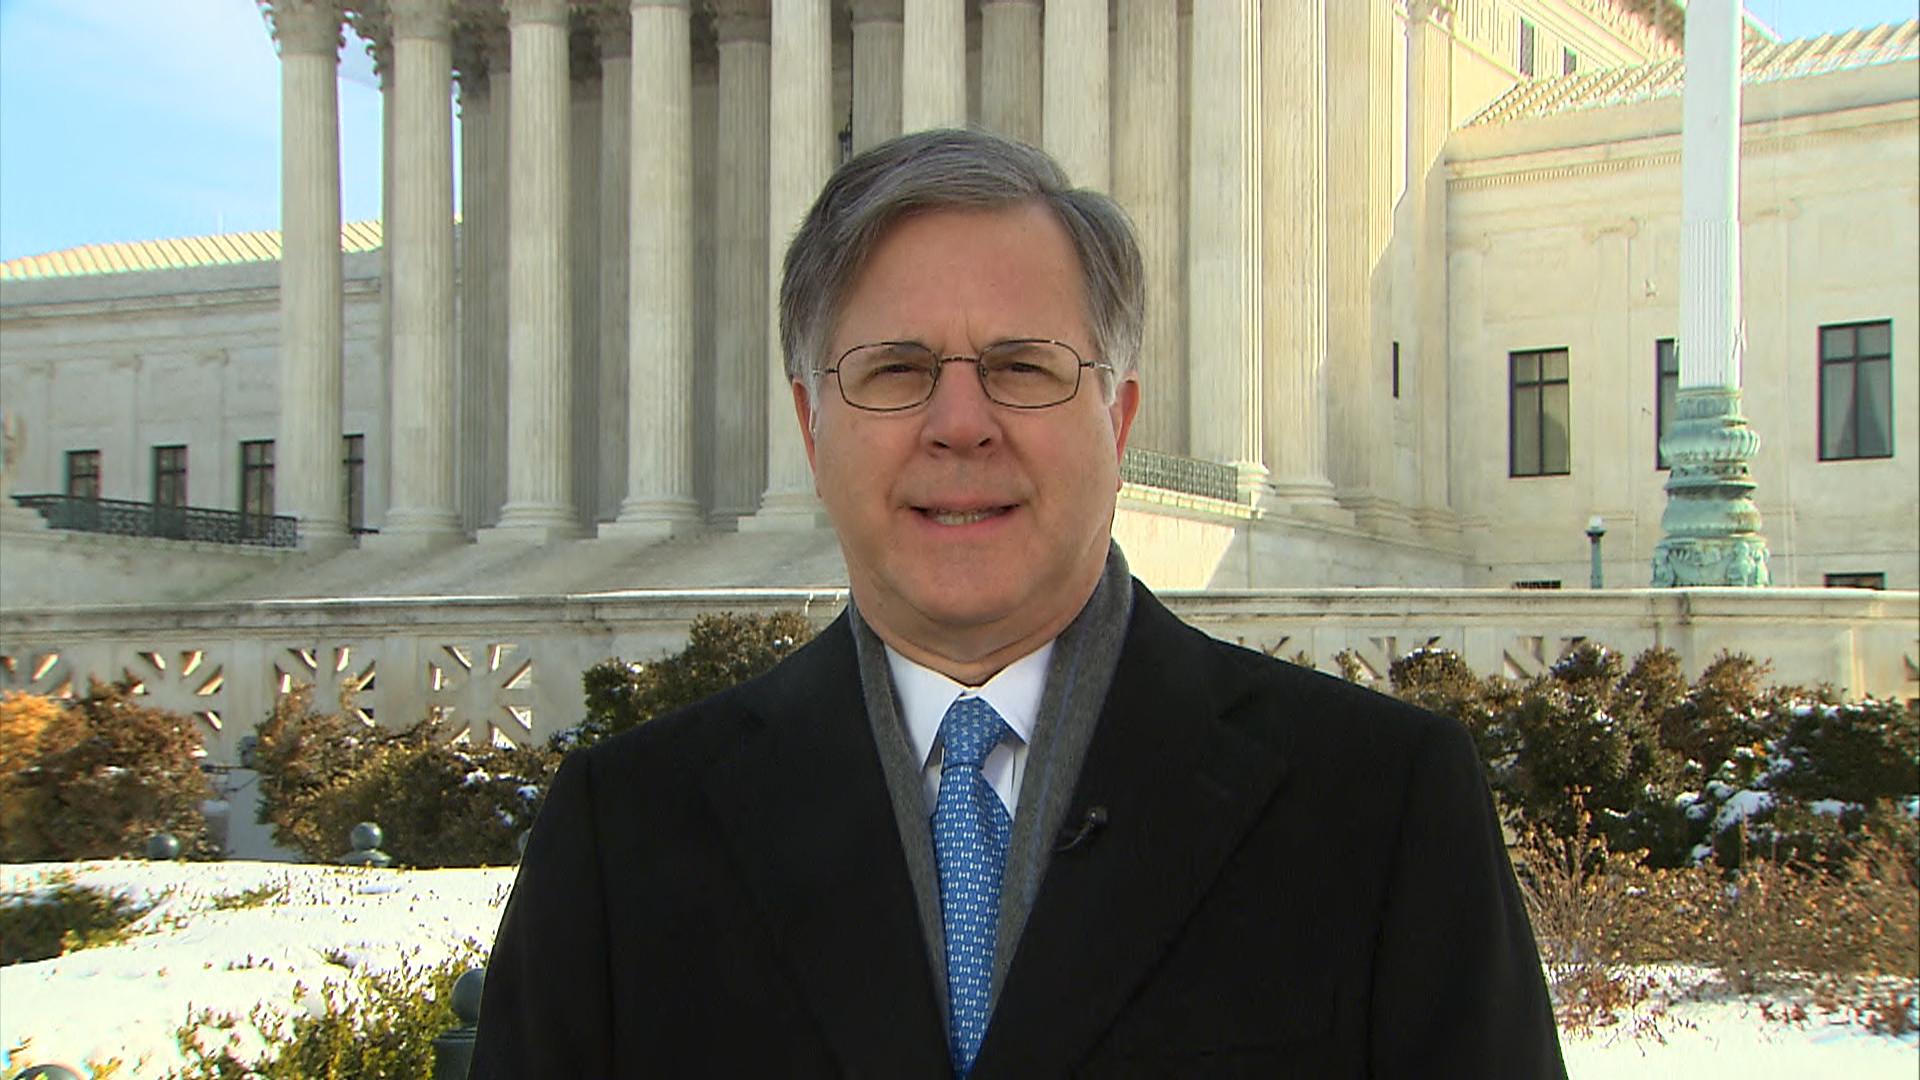 Kentucky Atty. Gen. won't defend marriage ban